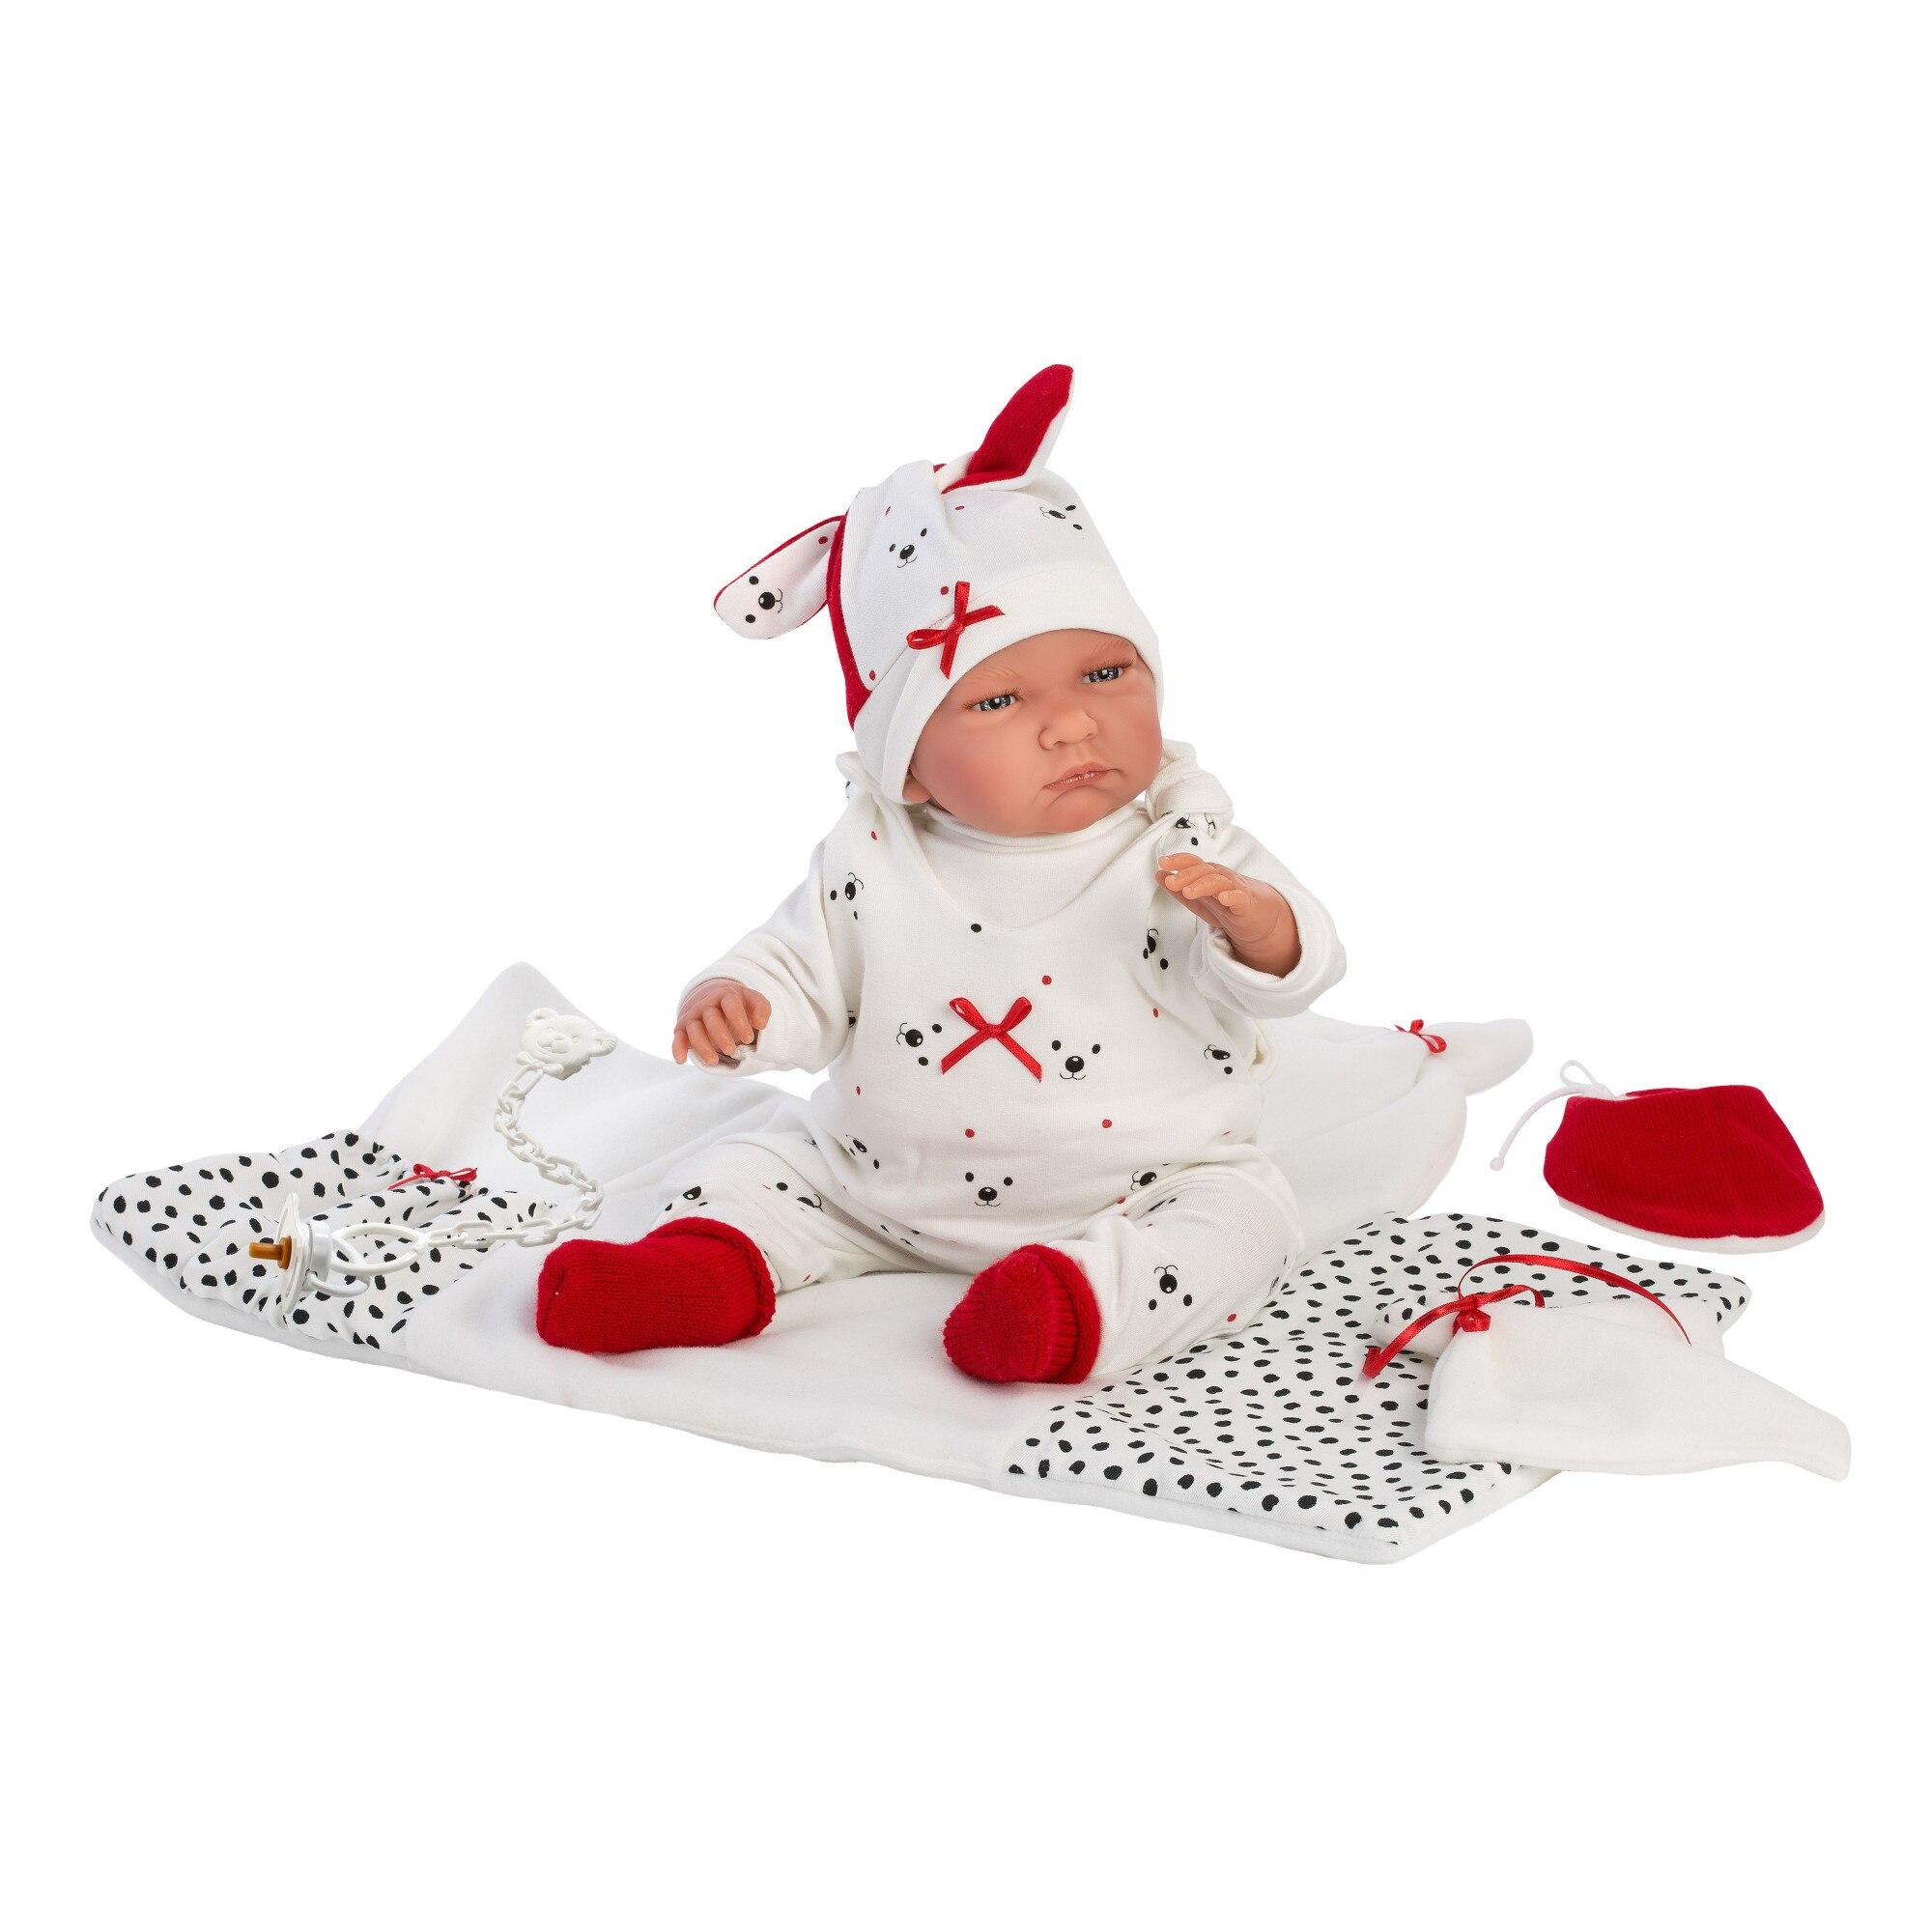 Fotografie Papusa interactiva Llorens Newborns That Cry - Baby Lalo, cu paturica, 42 cm